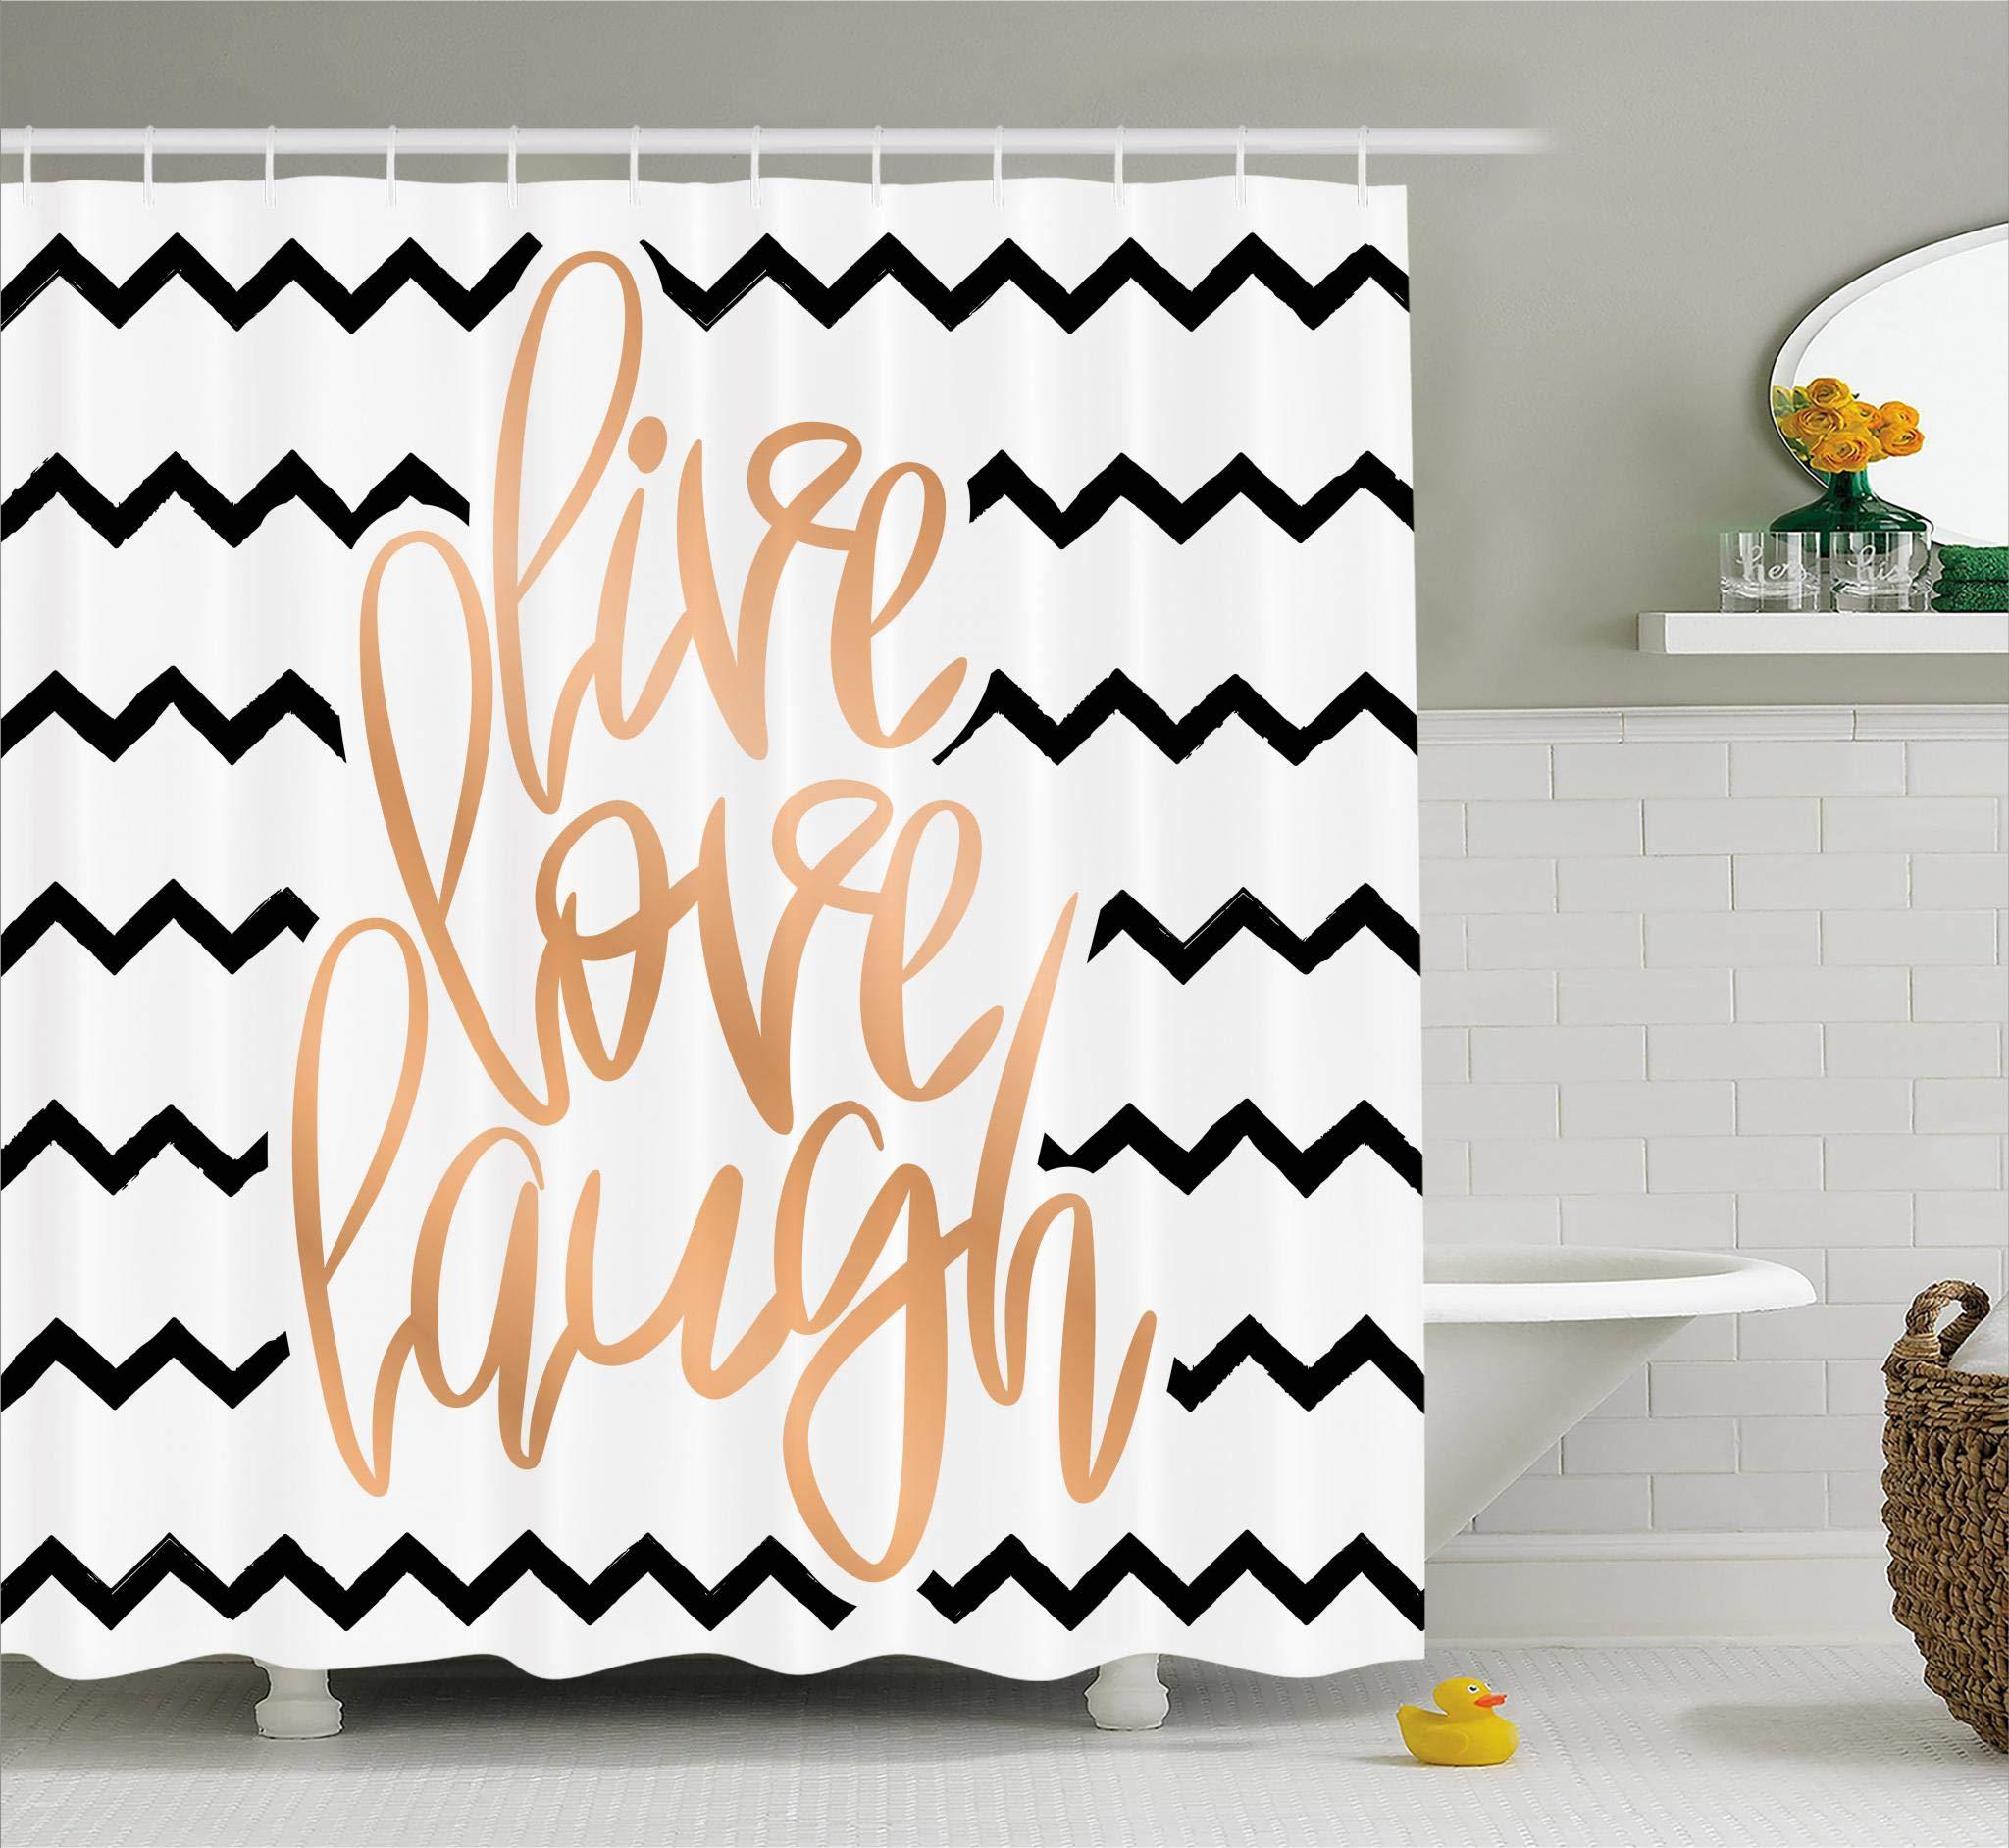 Ambesonne Live Laugh Love Decor Shower Curtain, Motivational Calligraphic Art Zigzags Chevron Stripes, Fabric Bathroom Decor Set Hooks, 70 inches, Black White Peach